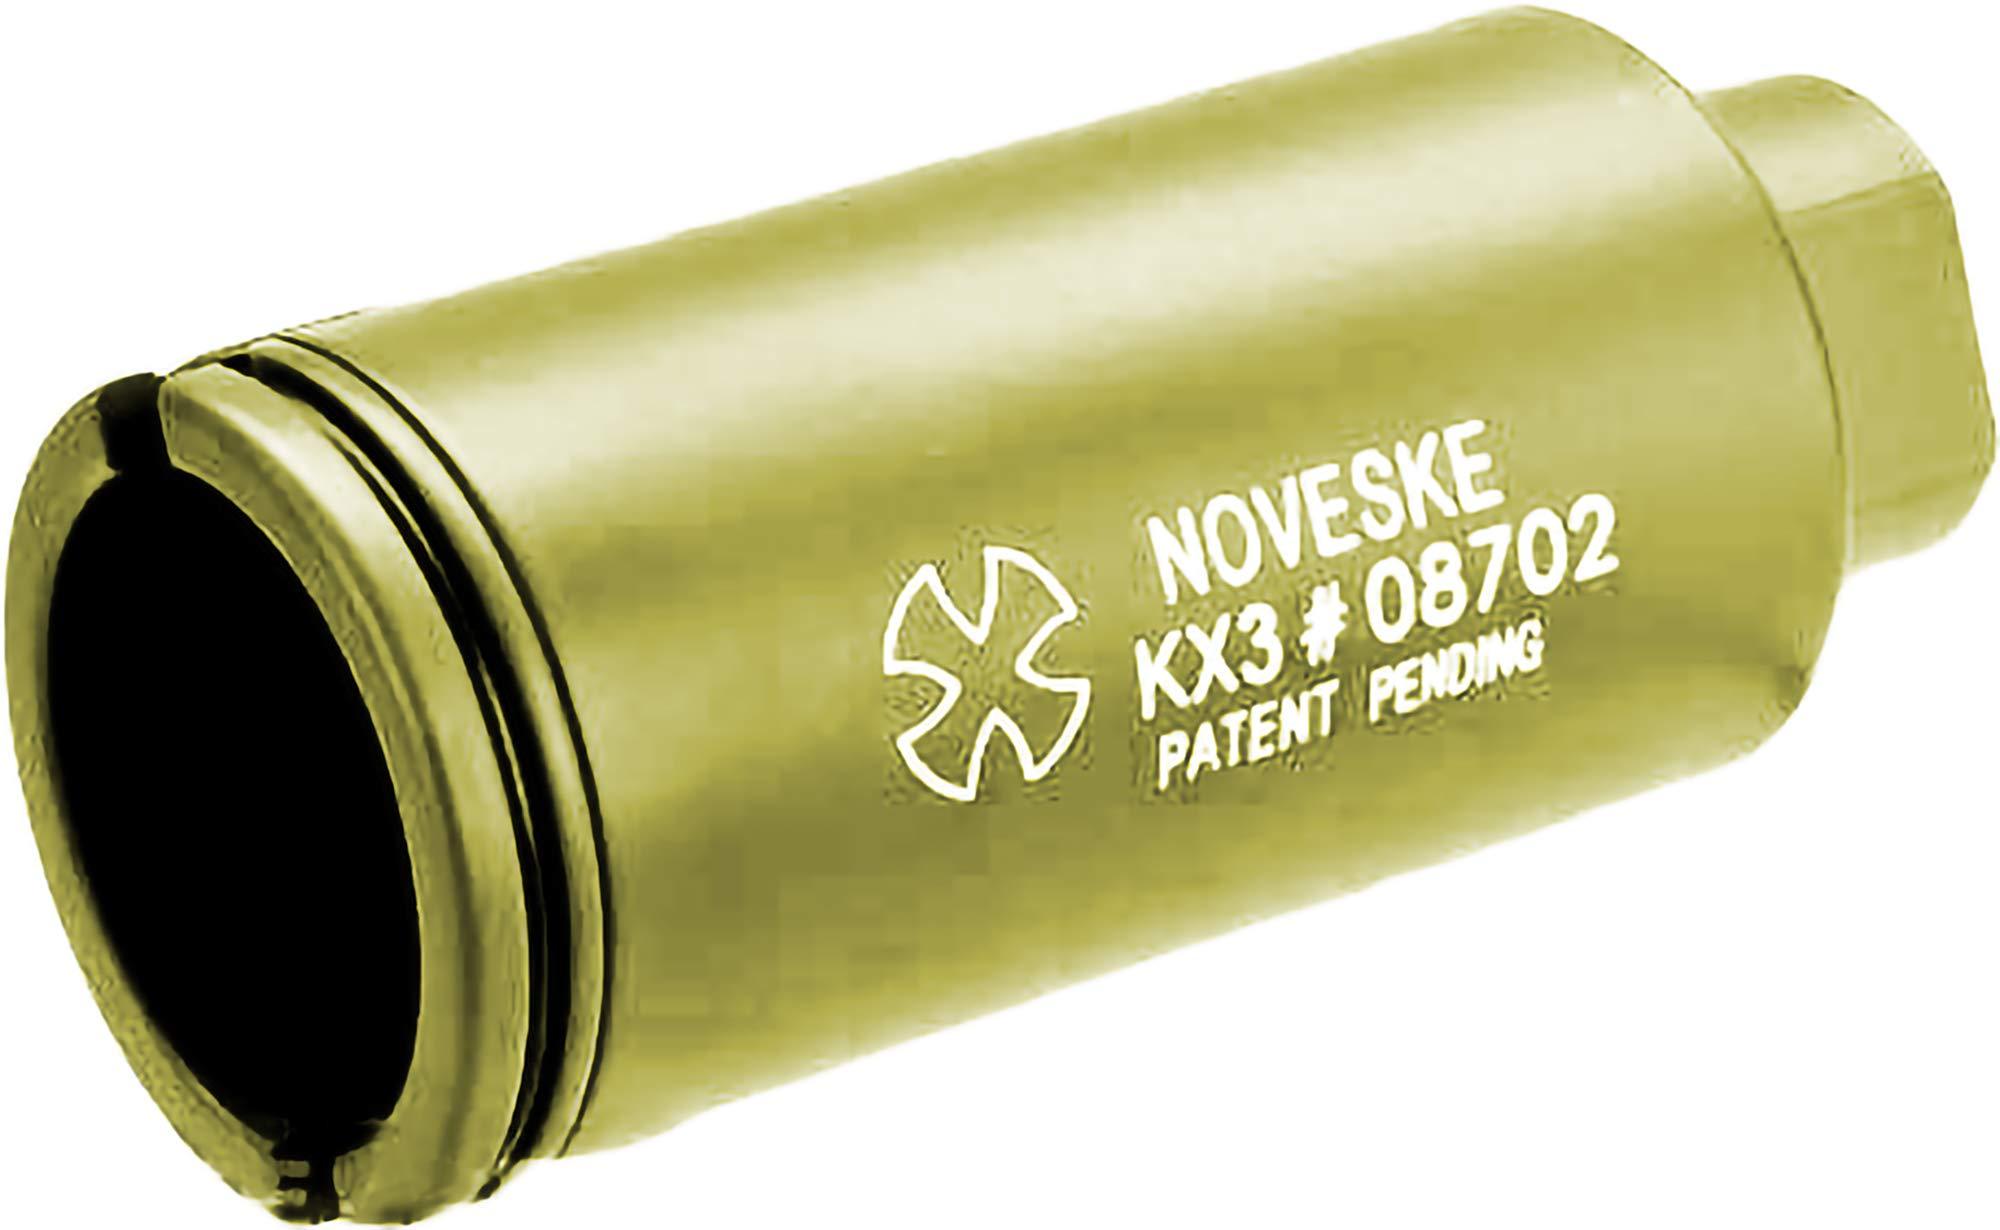 Evike Madbull Noveske KX3 Airsoft Sound Amplifier System (Color: Gold / 14mm Negative) by Evike